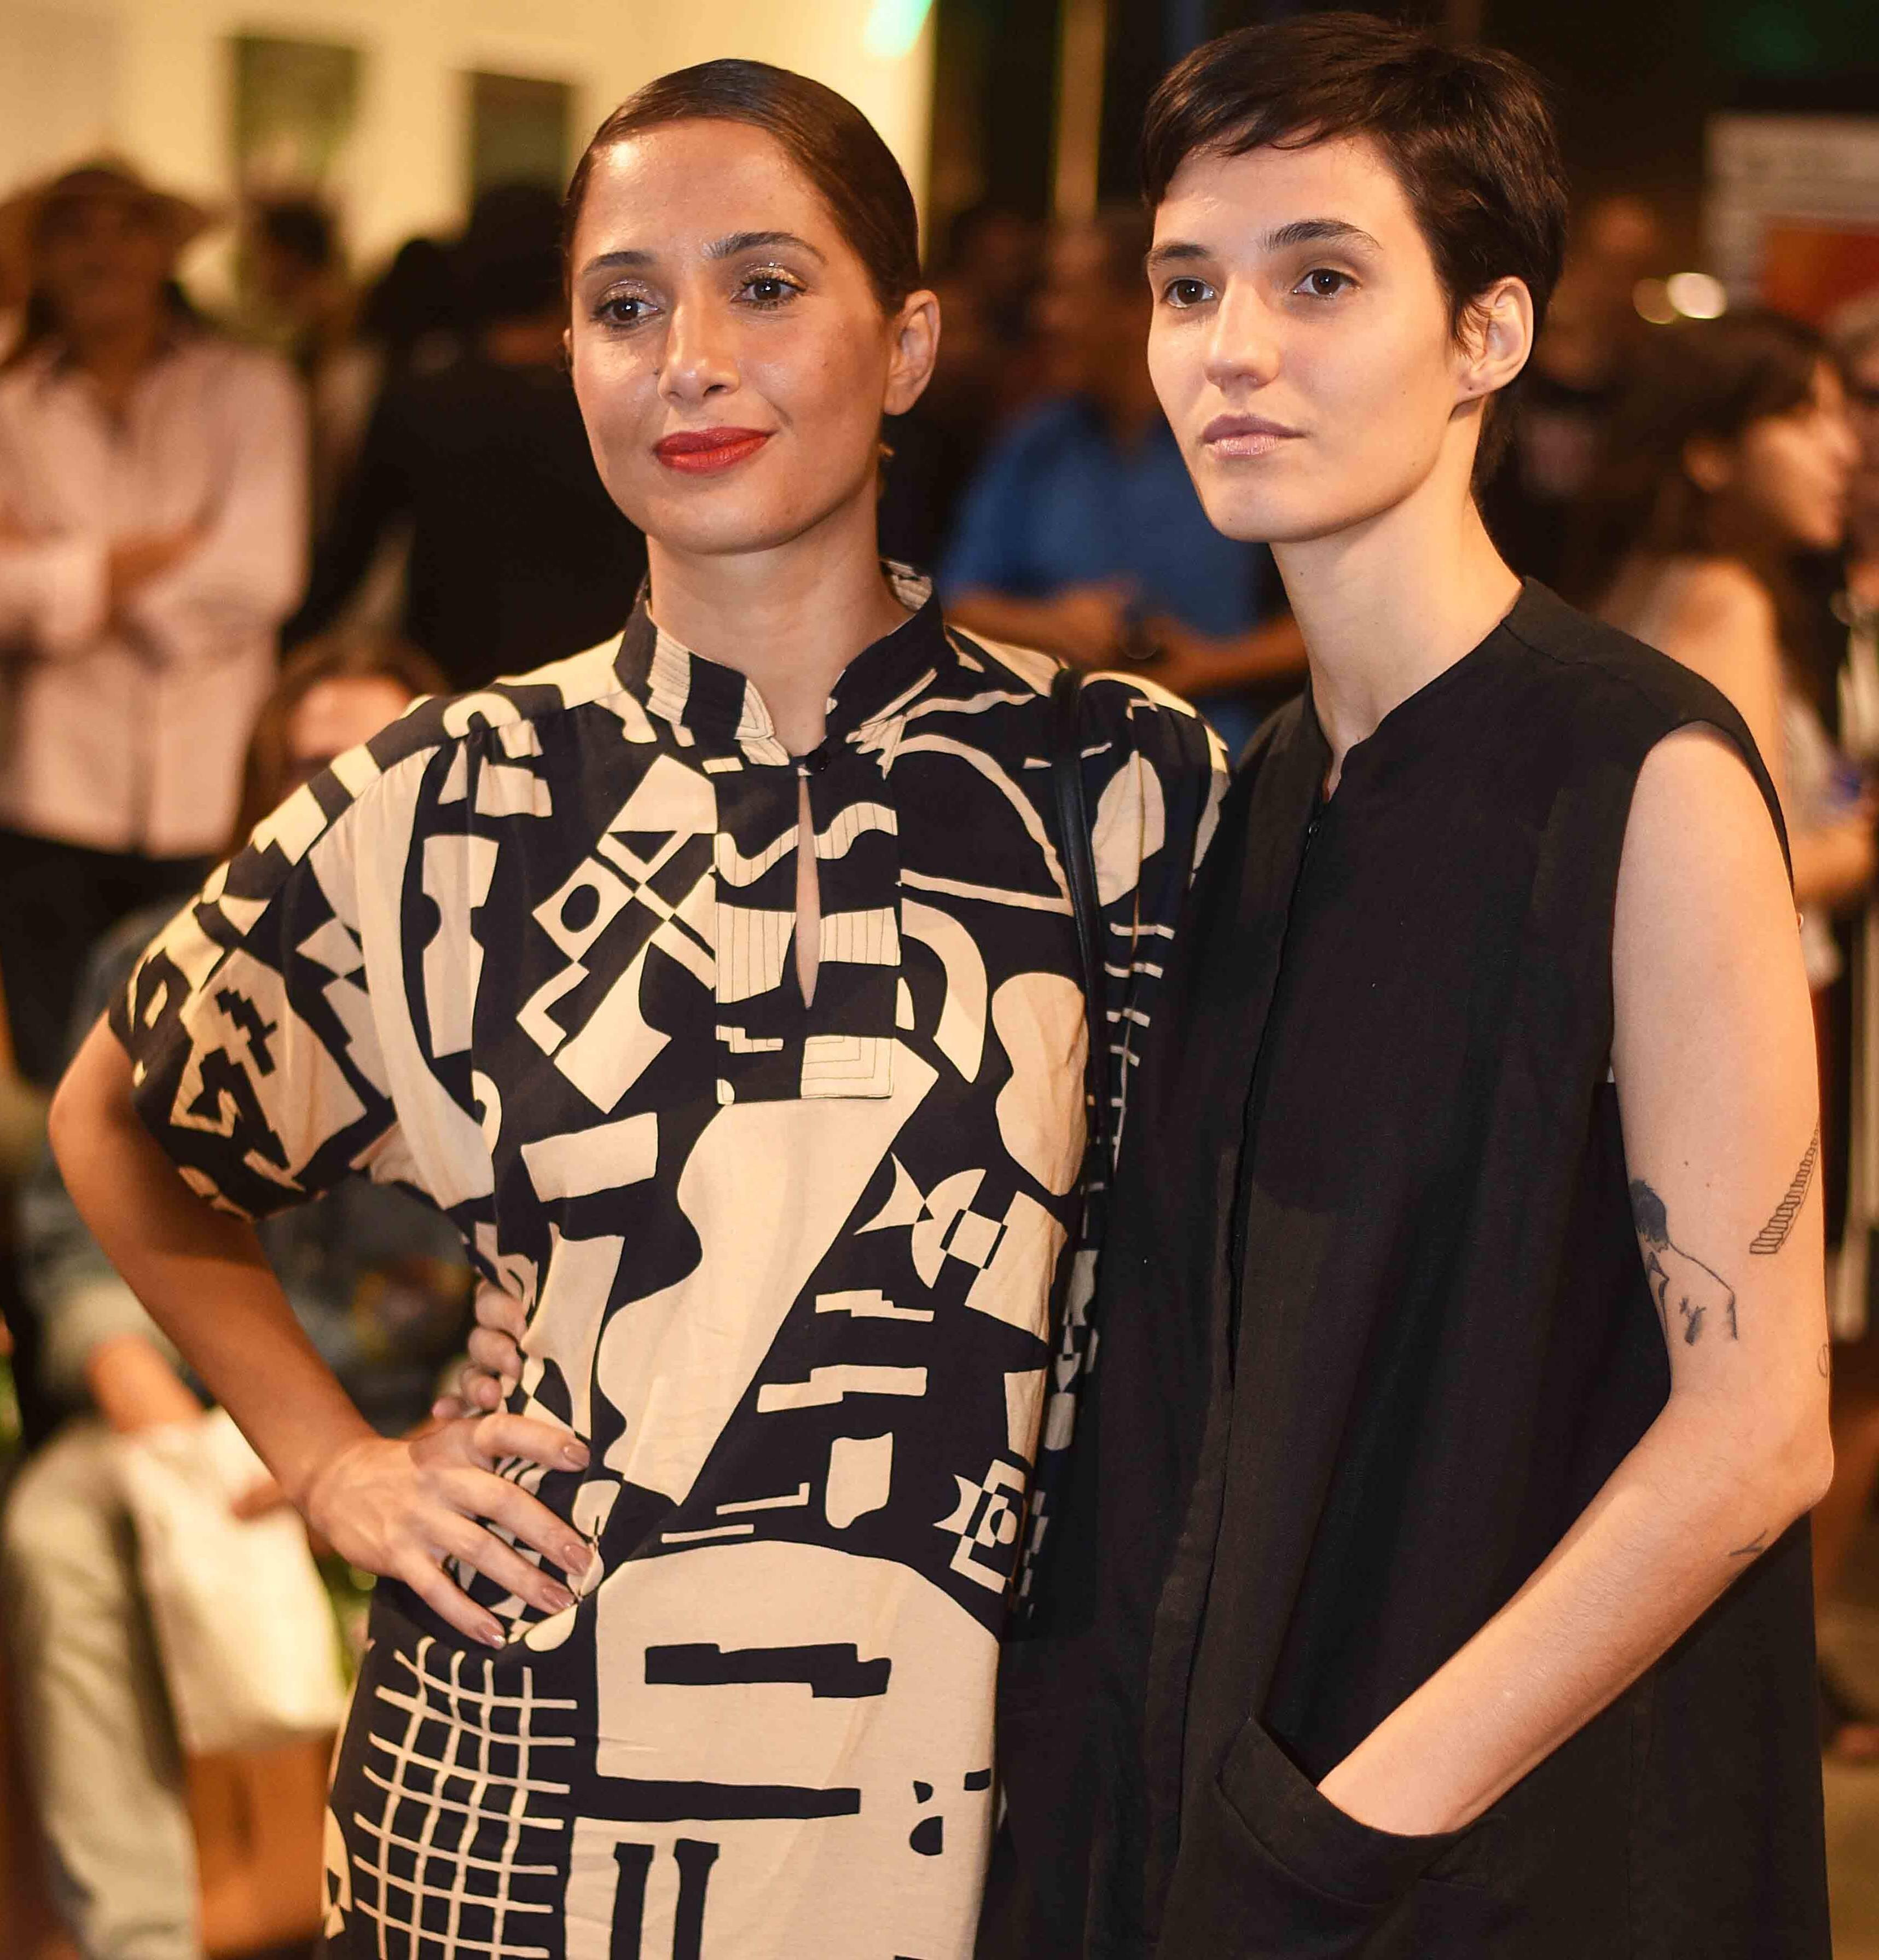 O casal Camila Pitanga e Beatriz Coelho /Foto: Ari Kaye